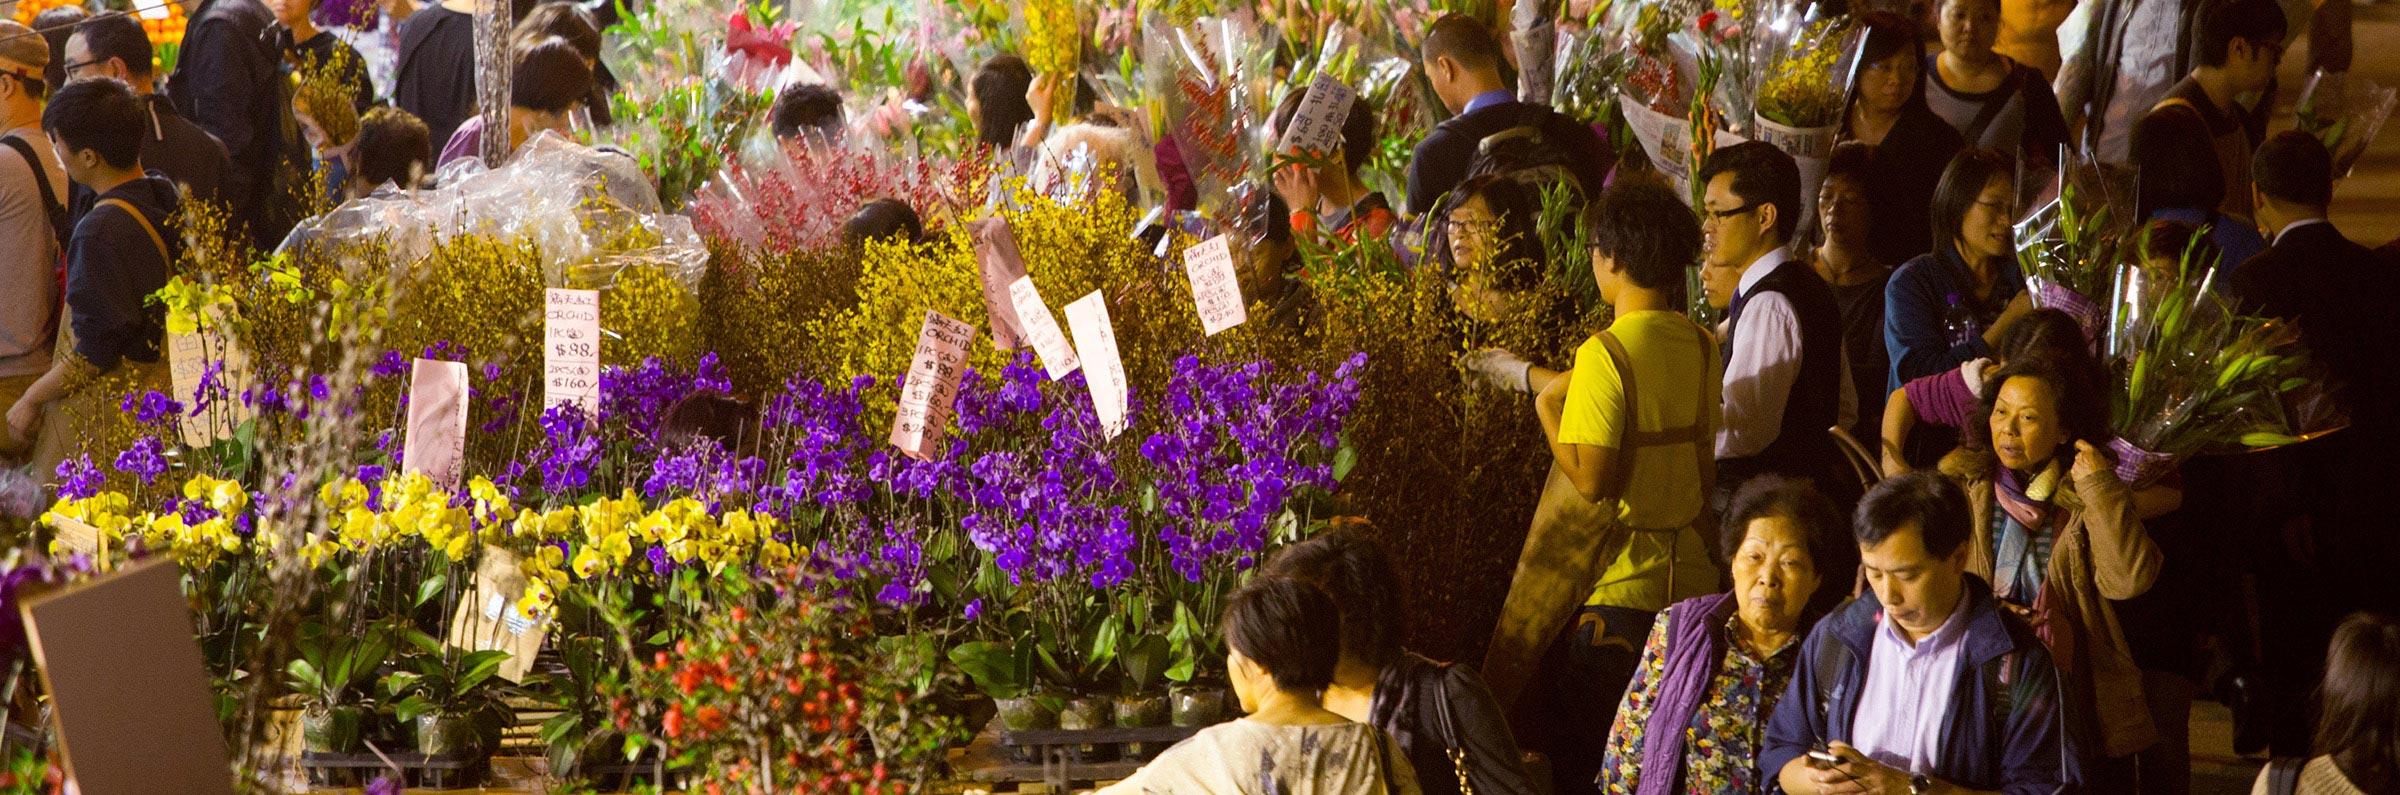 Compras in Hong Kong